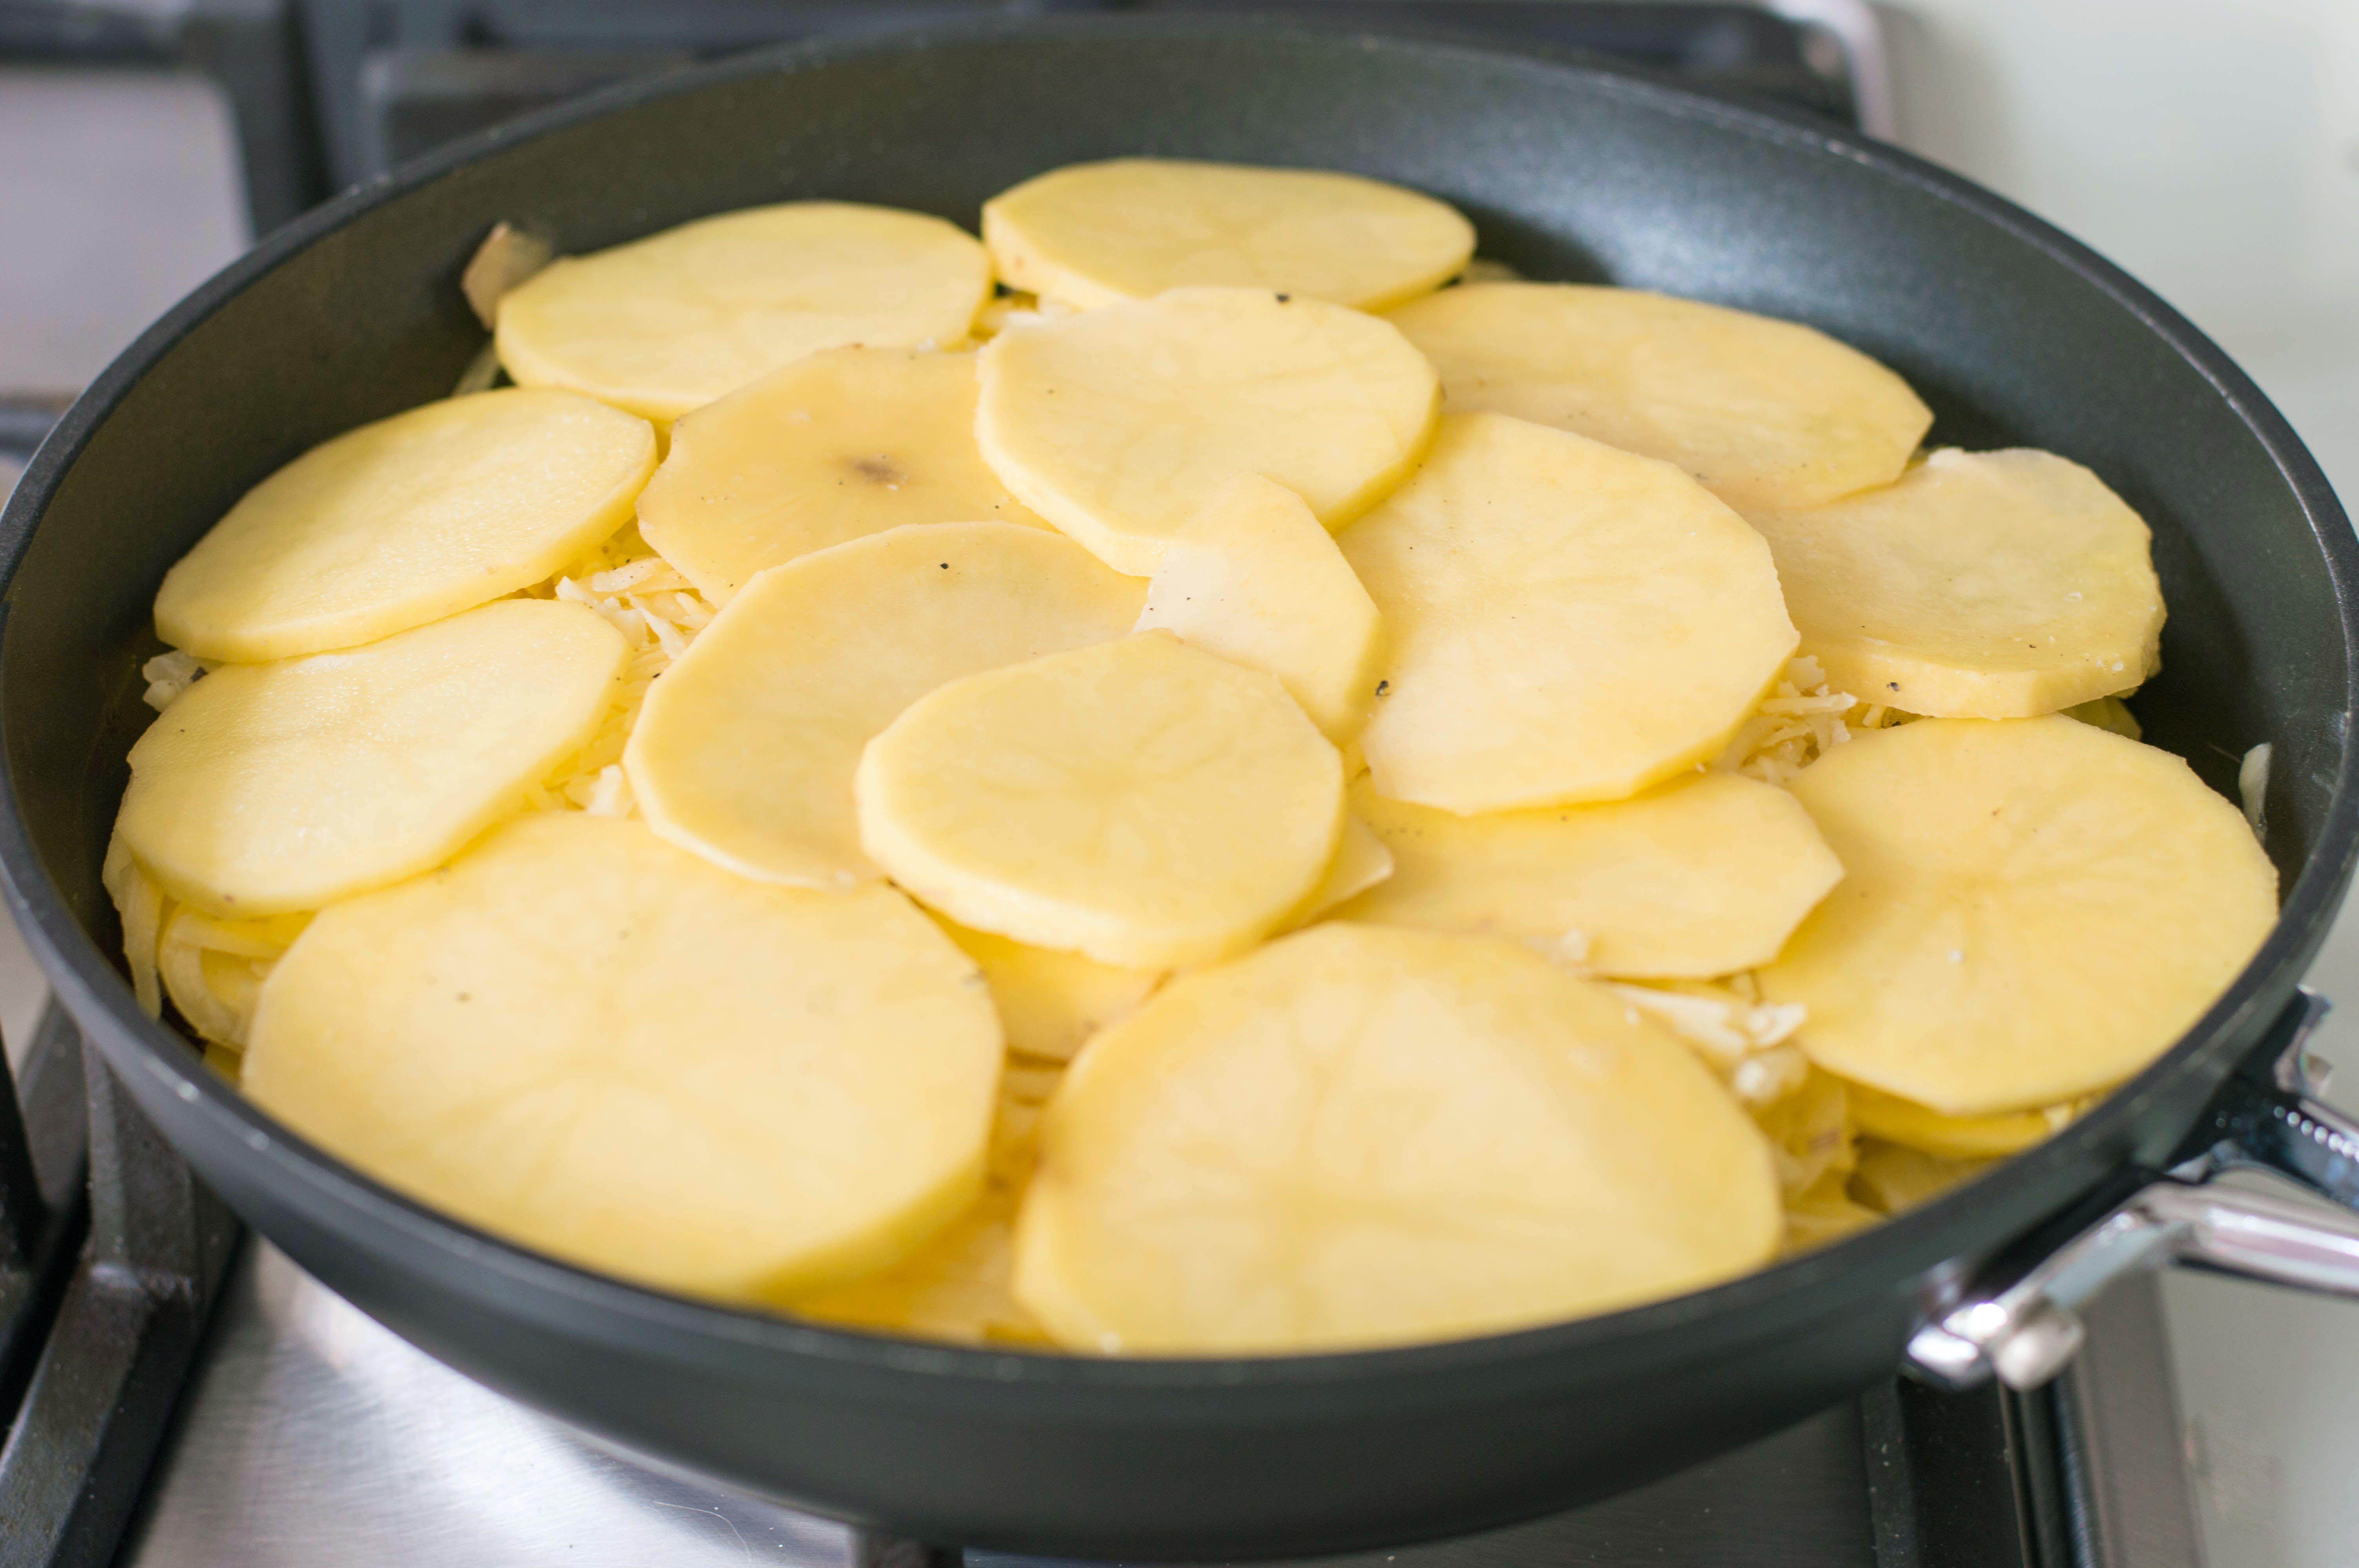 Place pan on medium heat